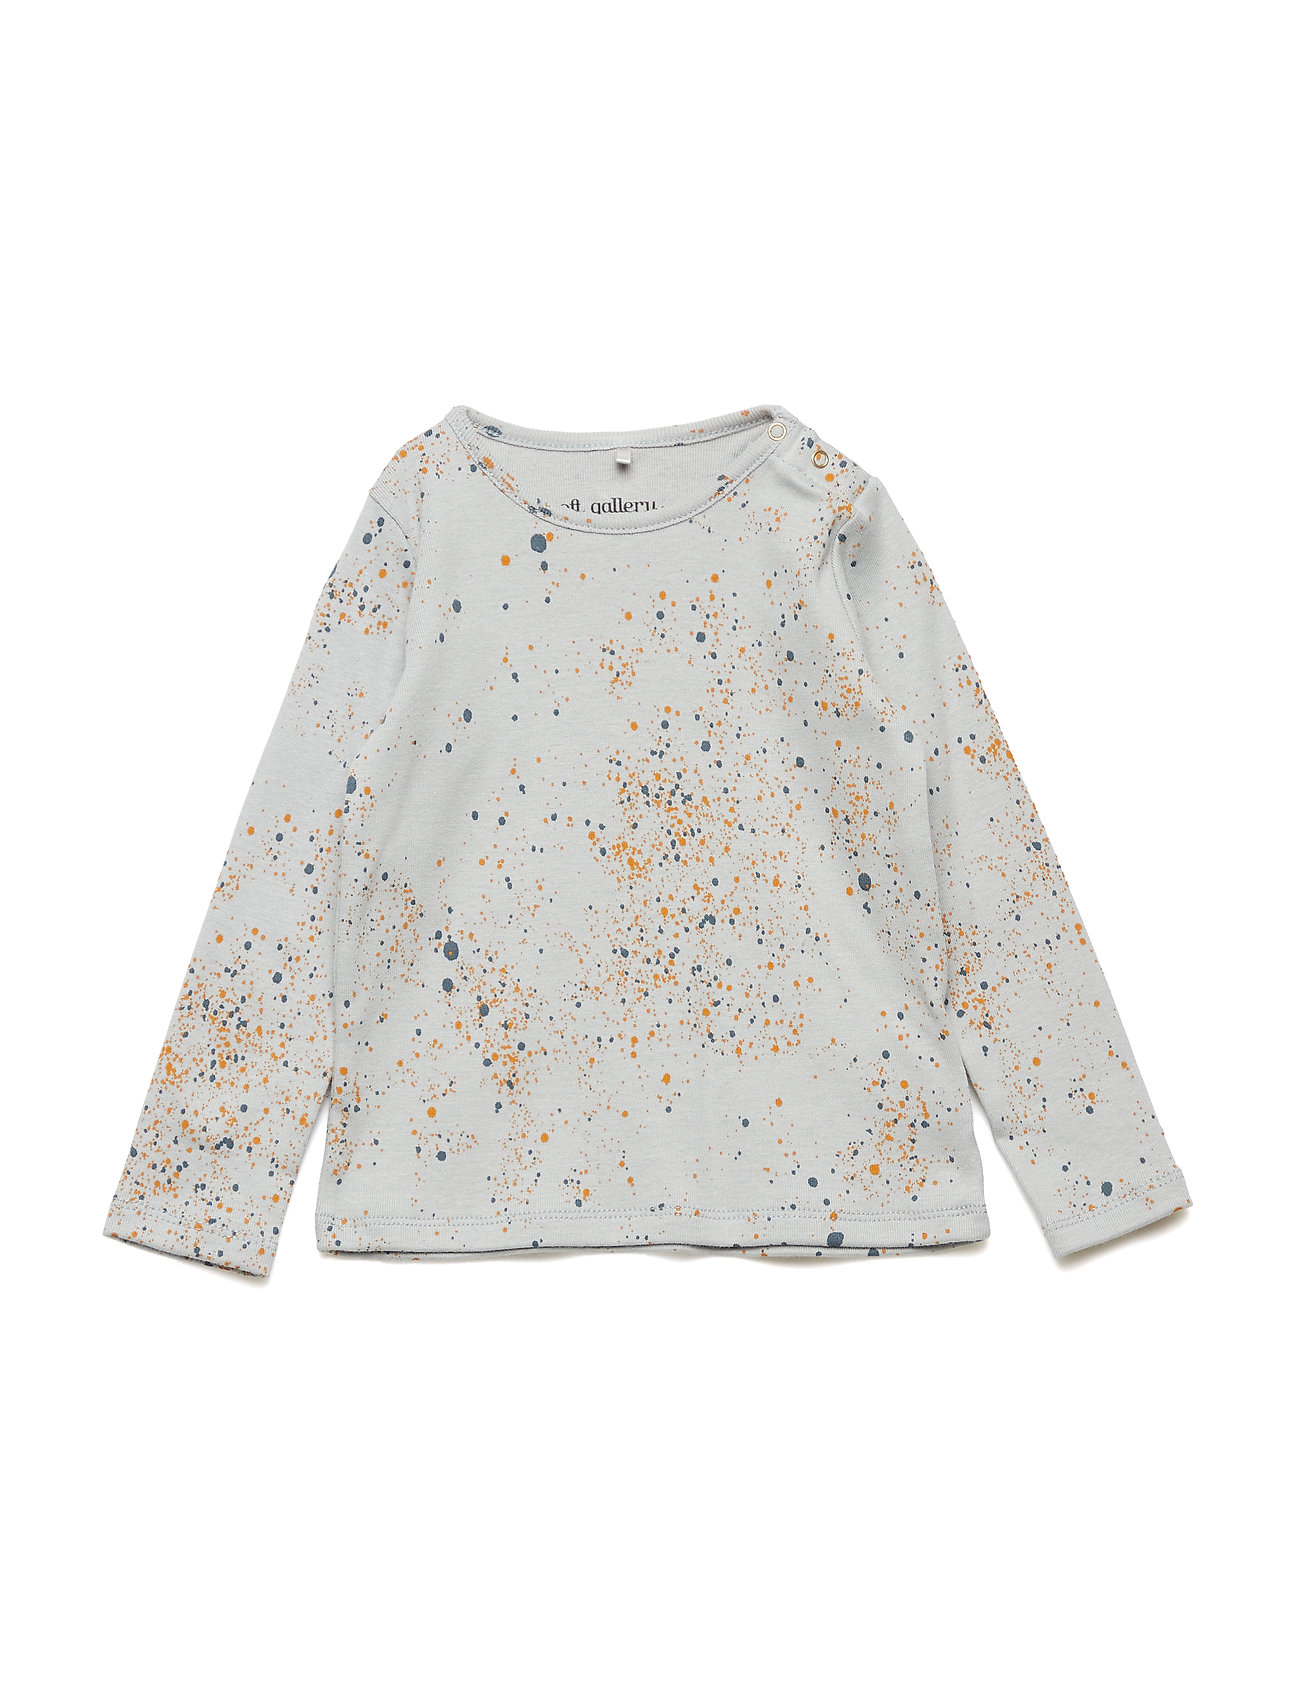 Soft Gallery Baby Bella T-shirt - OCEAN GREY, AOP MINI SPLASH BLUE